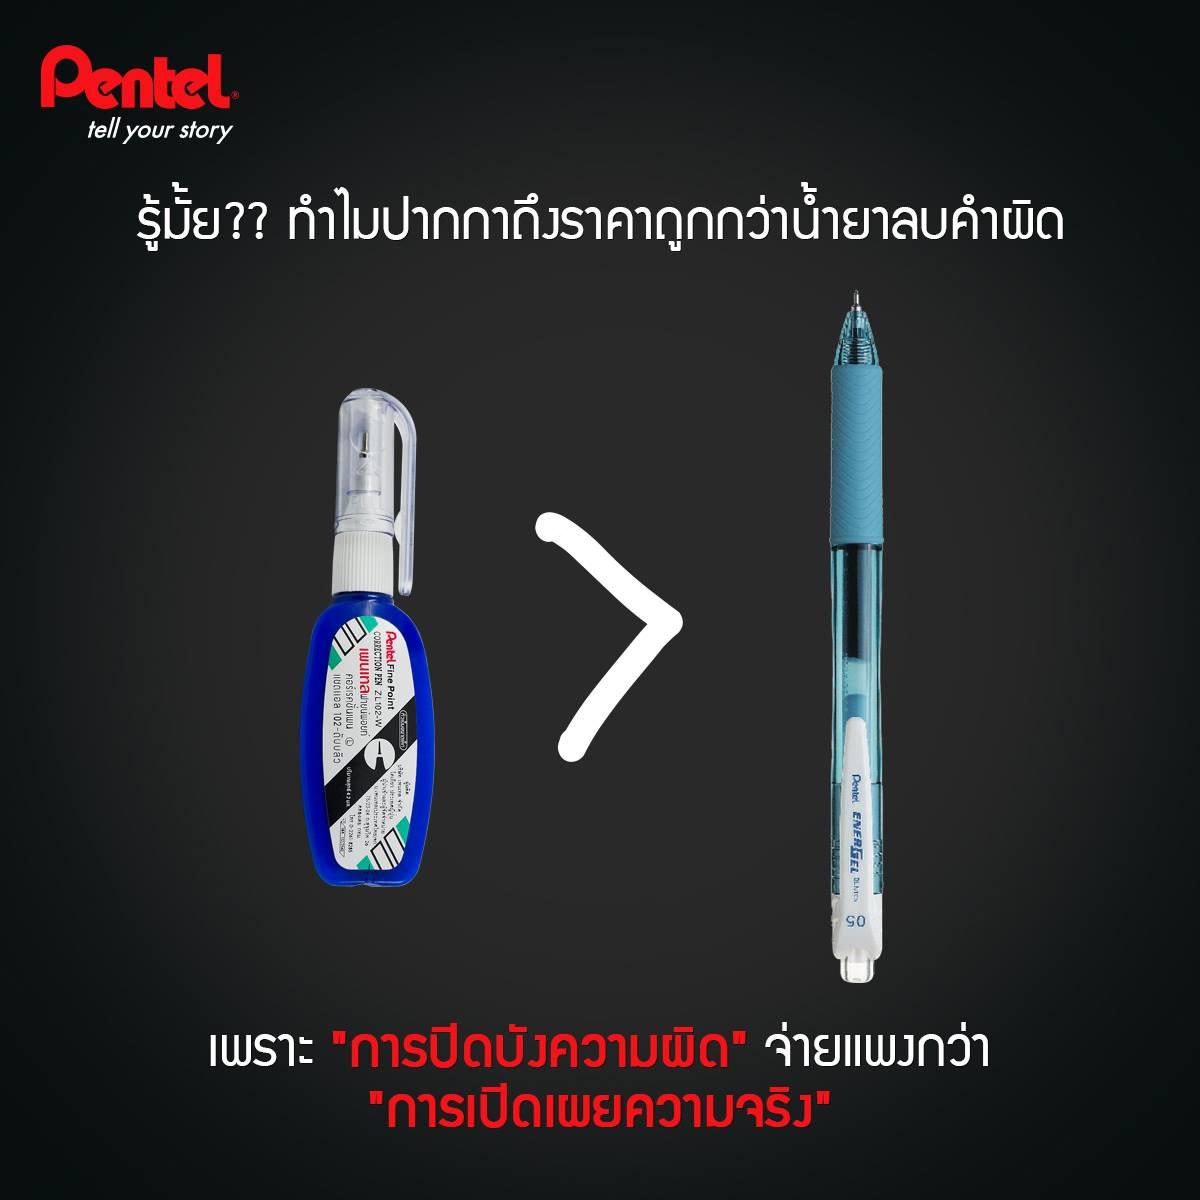 Pentel Ad